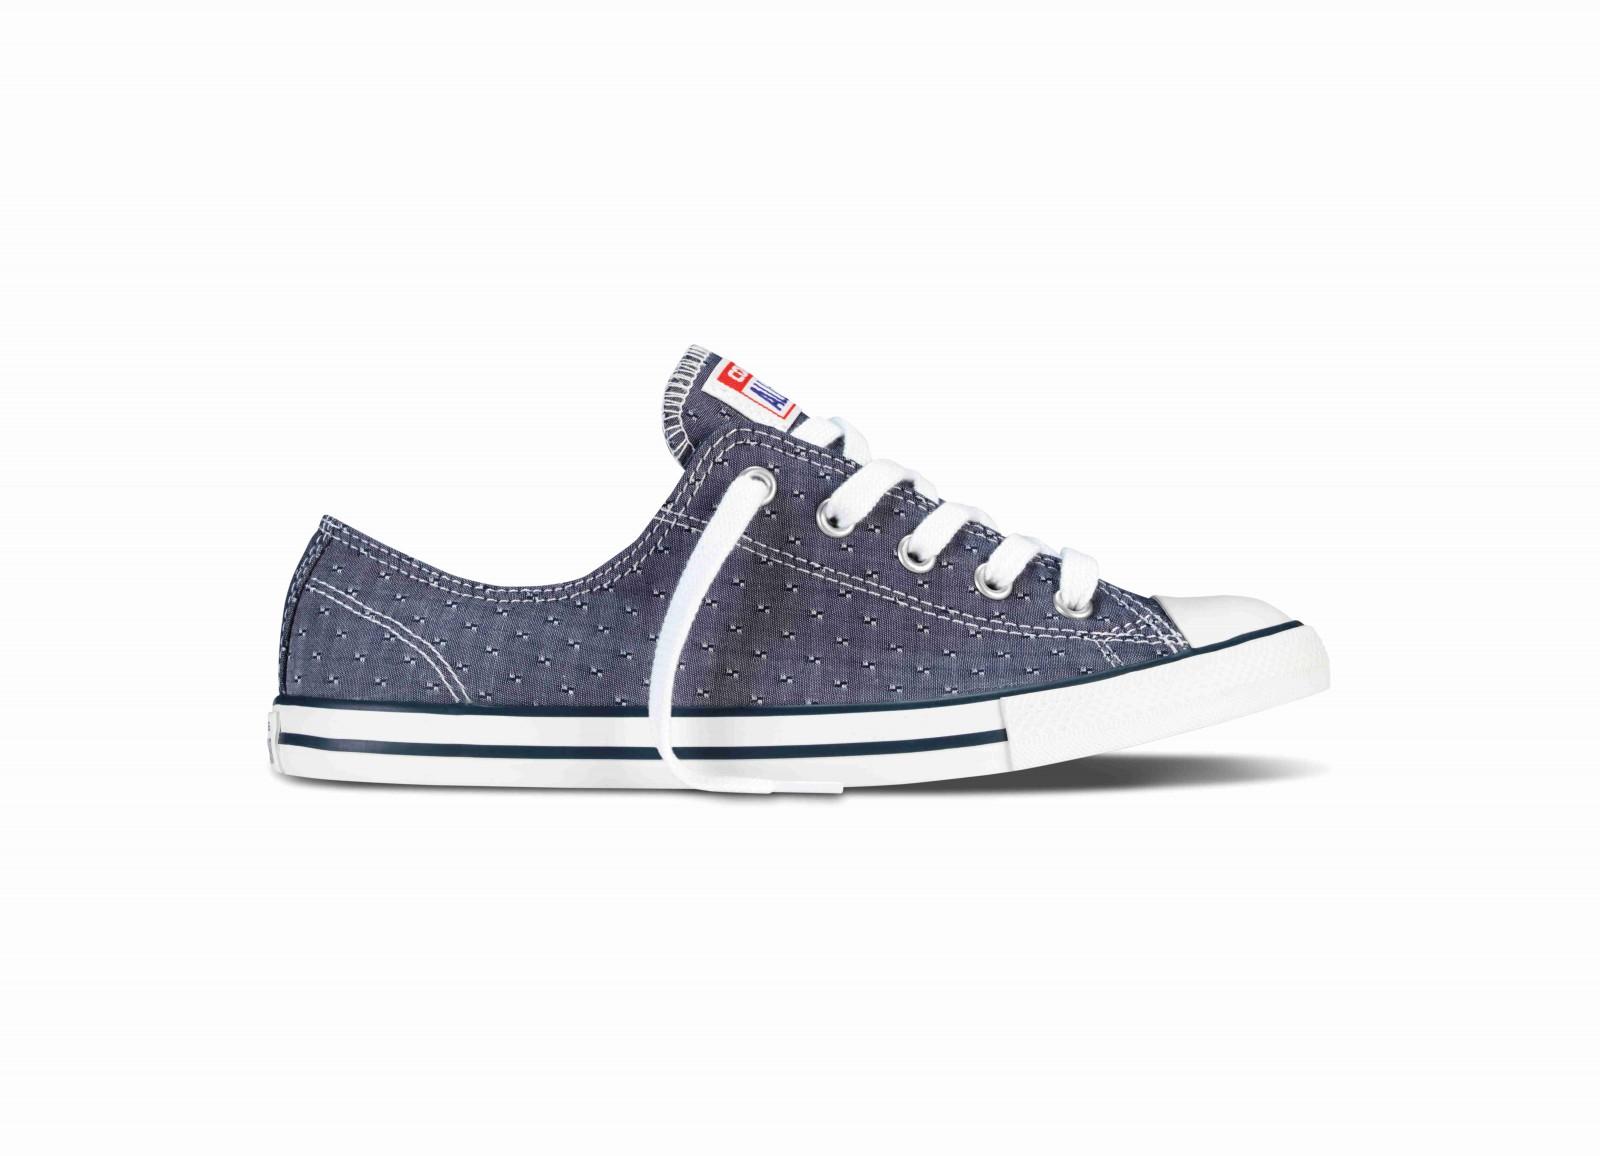 8874fbda0646 Dámské boty Converse Chuck Taylor All Star Dainty modré